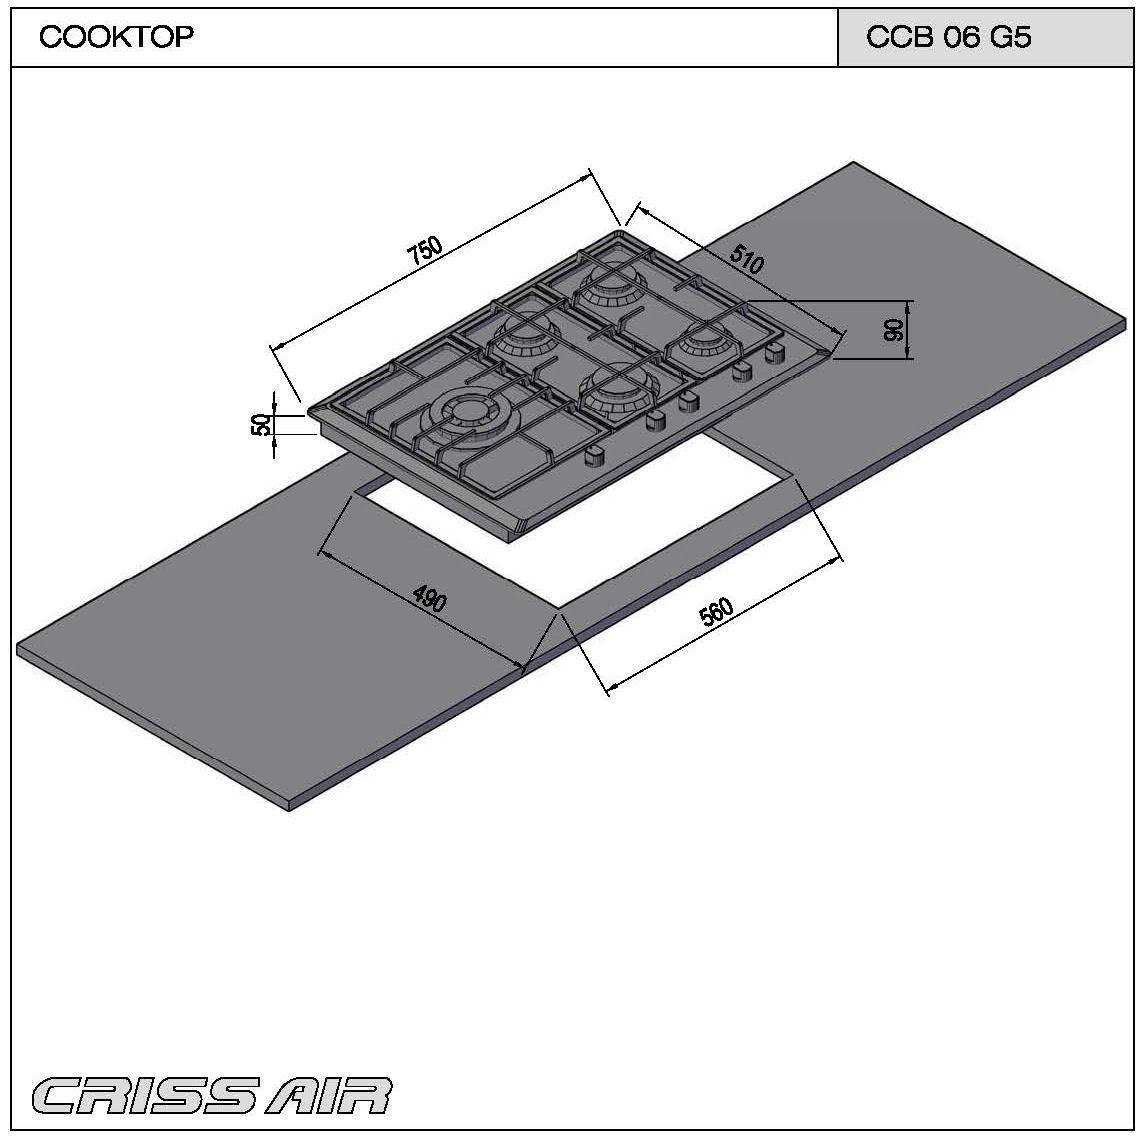 Cooktop a Gás CCB 06 G5